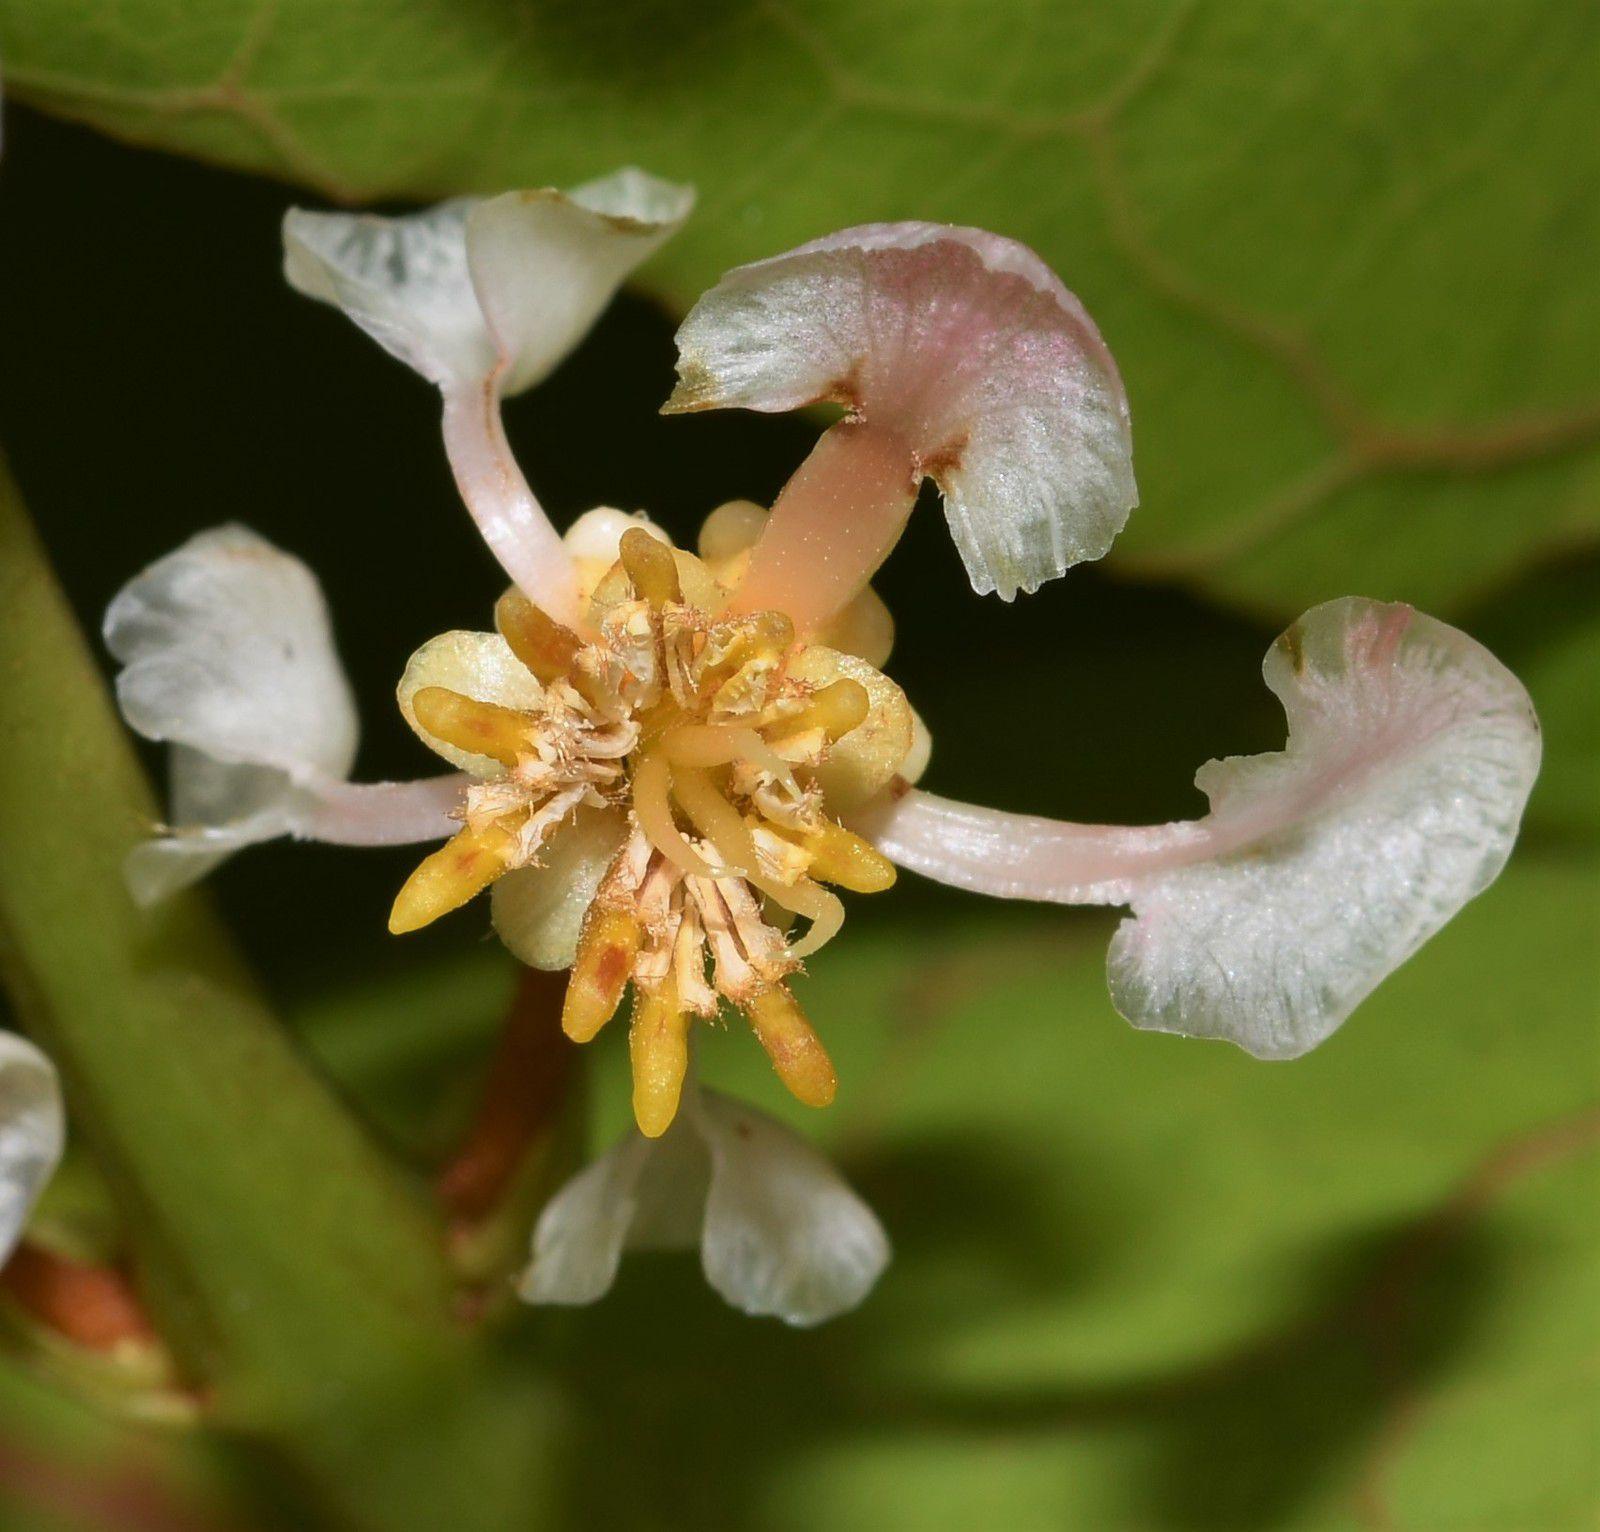 Byrsonima coccolobifolia